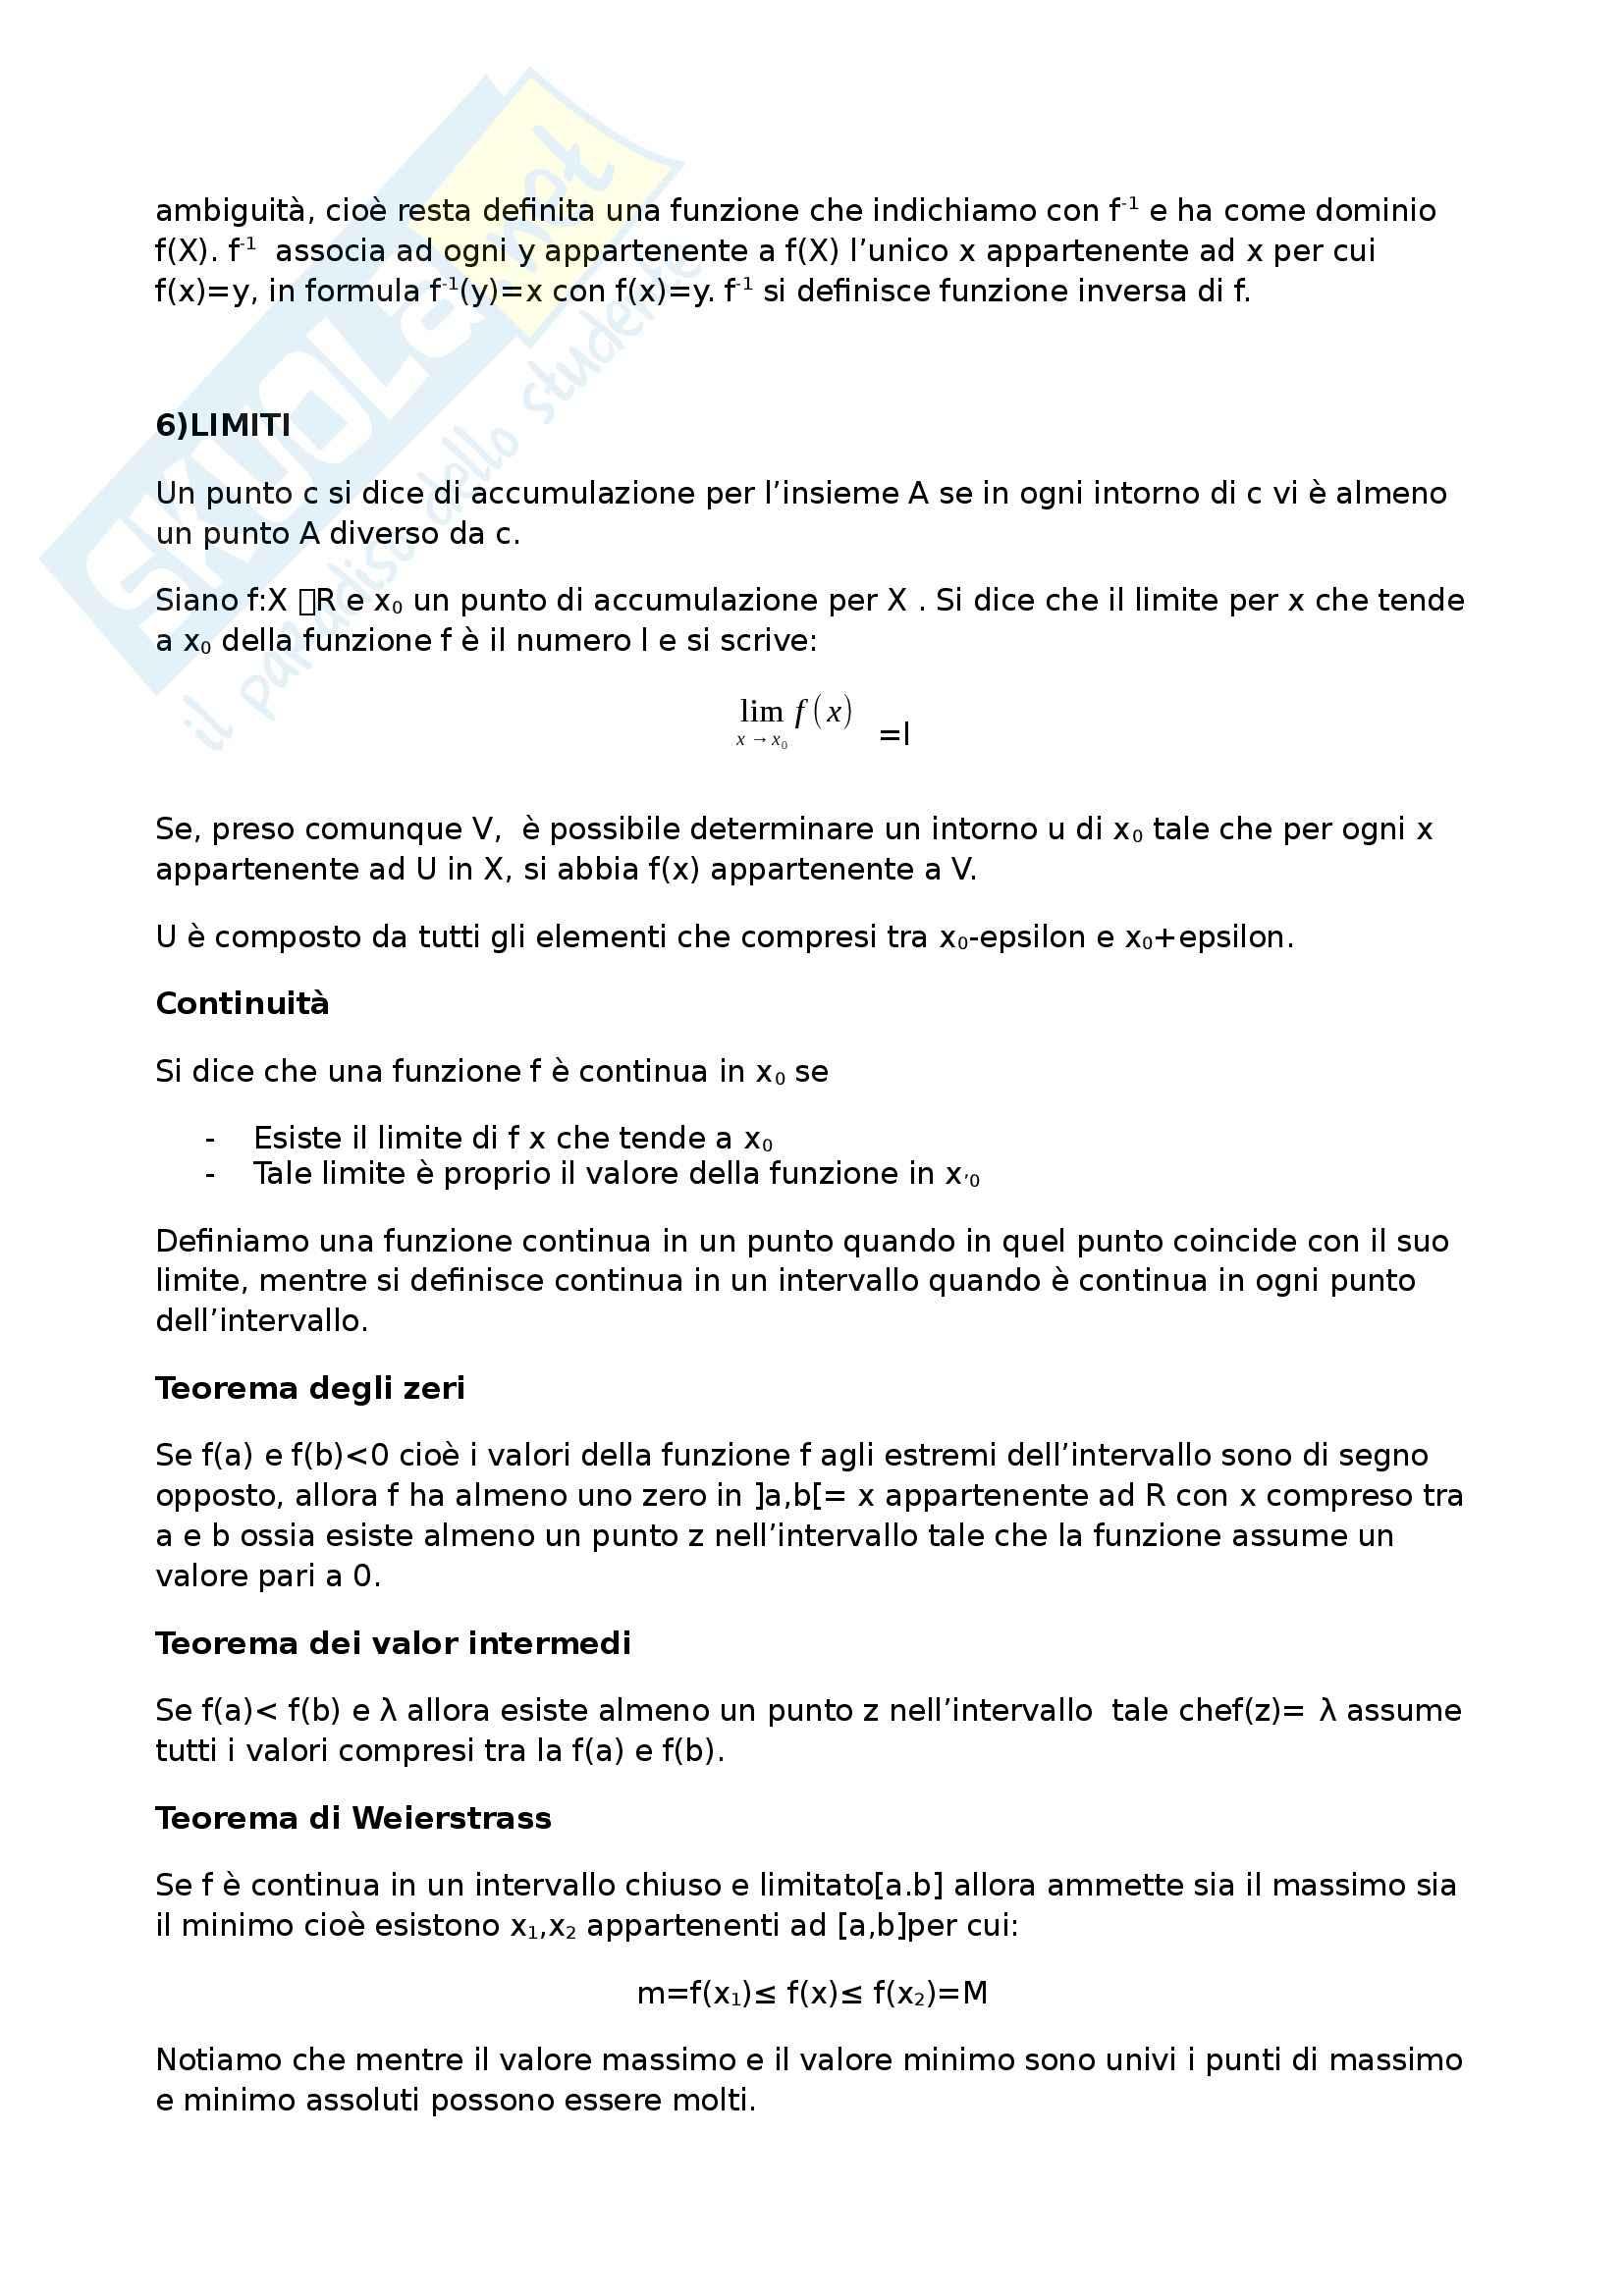 Riassunto esame Matematica Generale, prof. De Sanctis Pag. 6